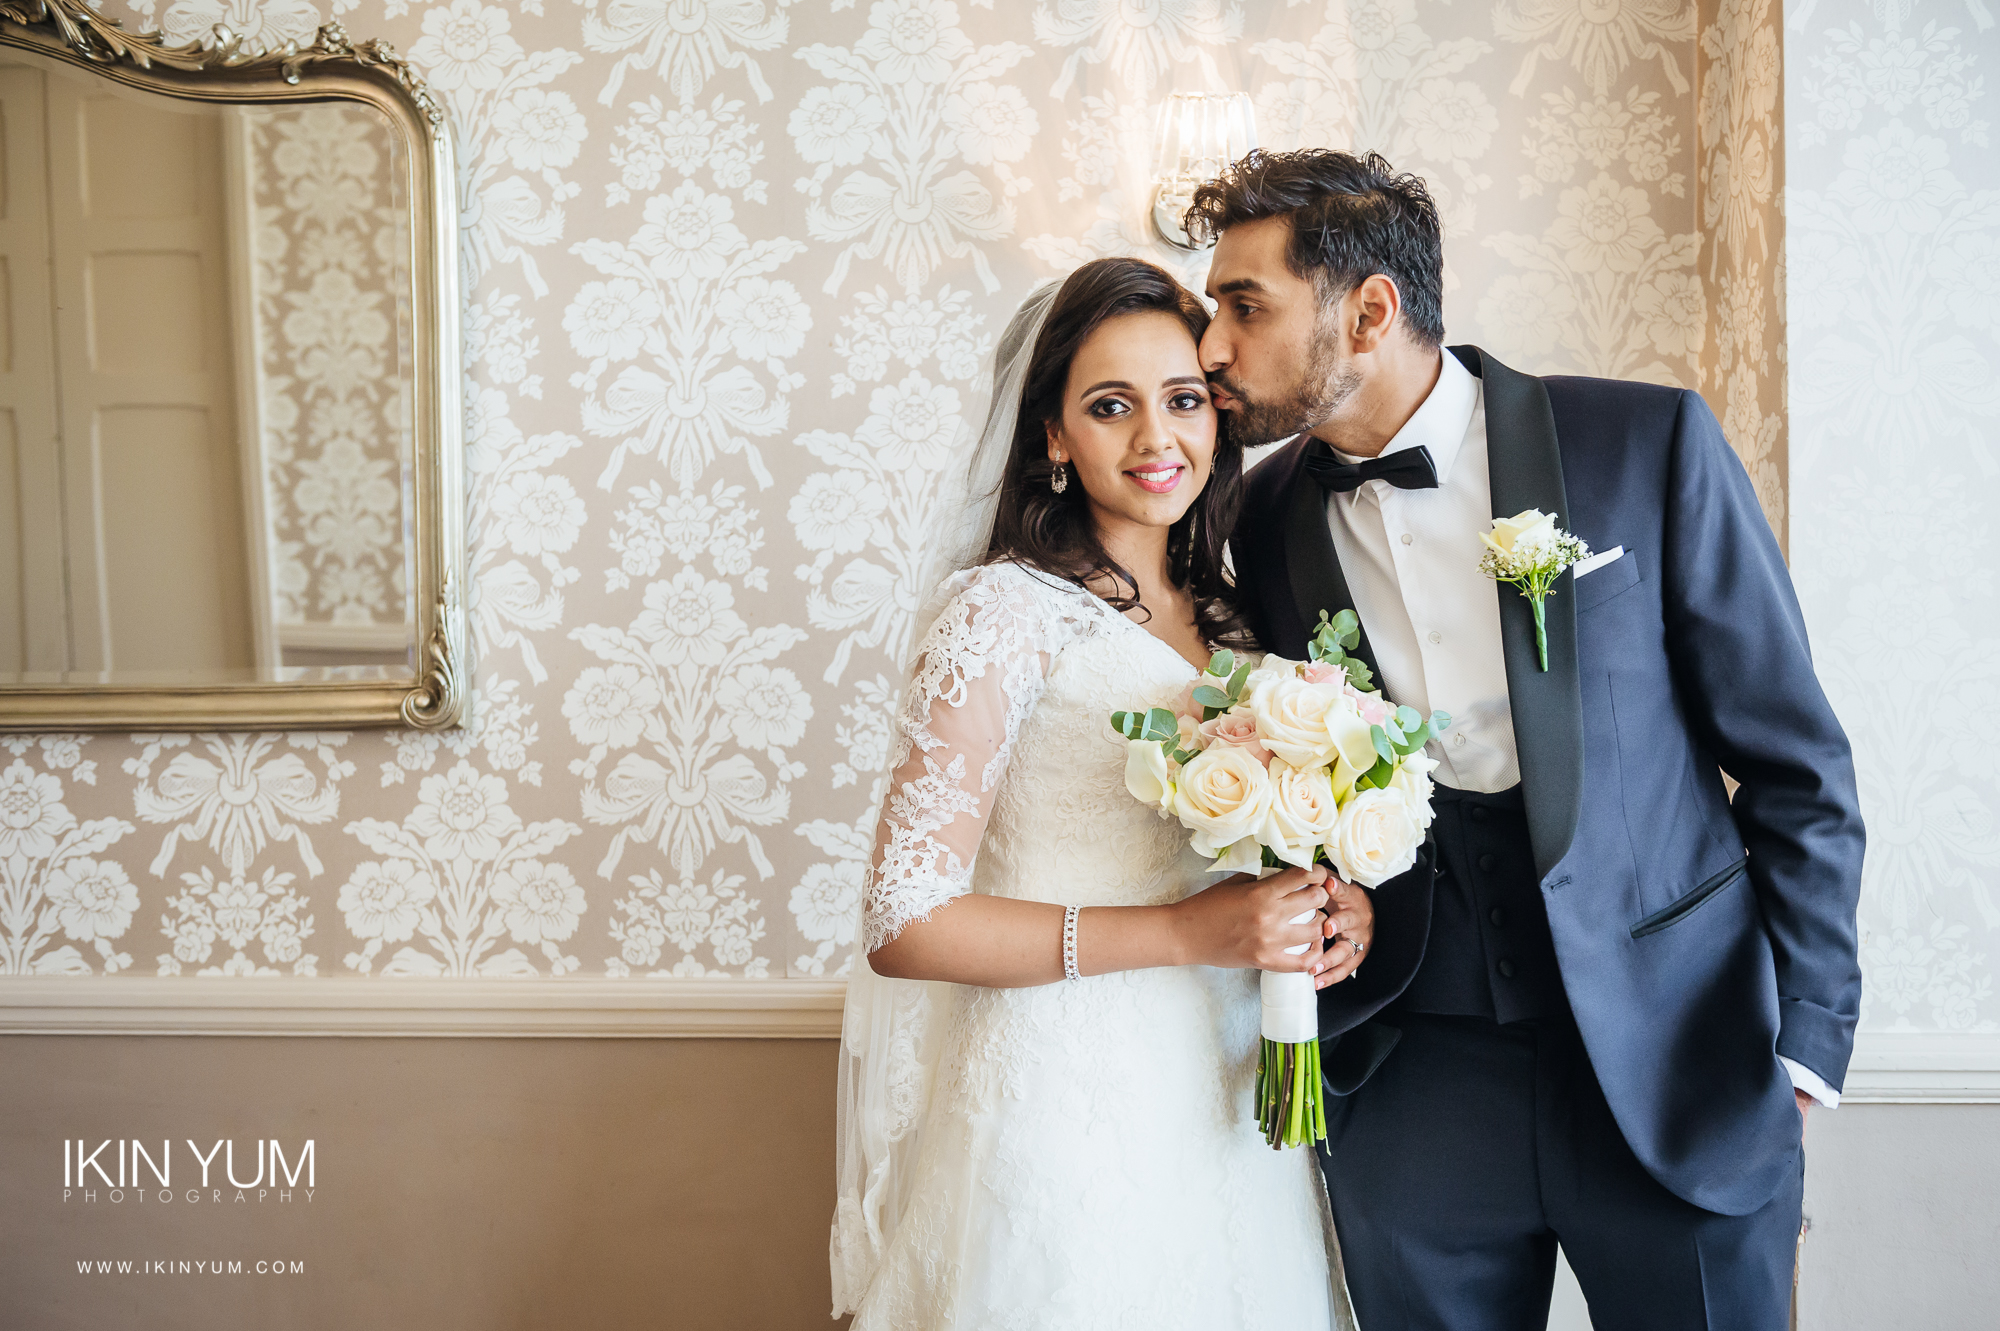 Laura Ashley Manor Wedding - Ikin Yum Photography-076.jpg